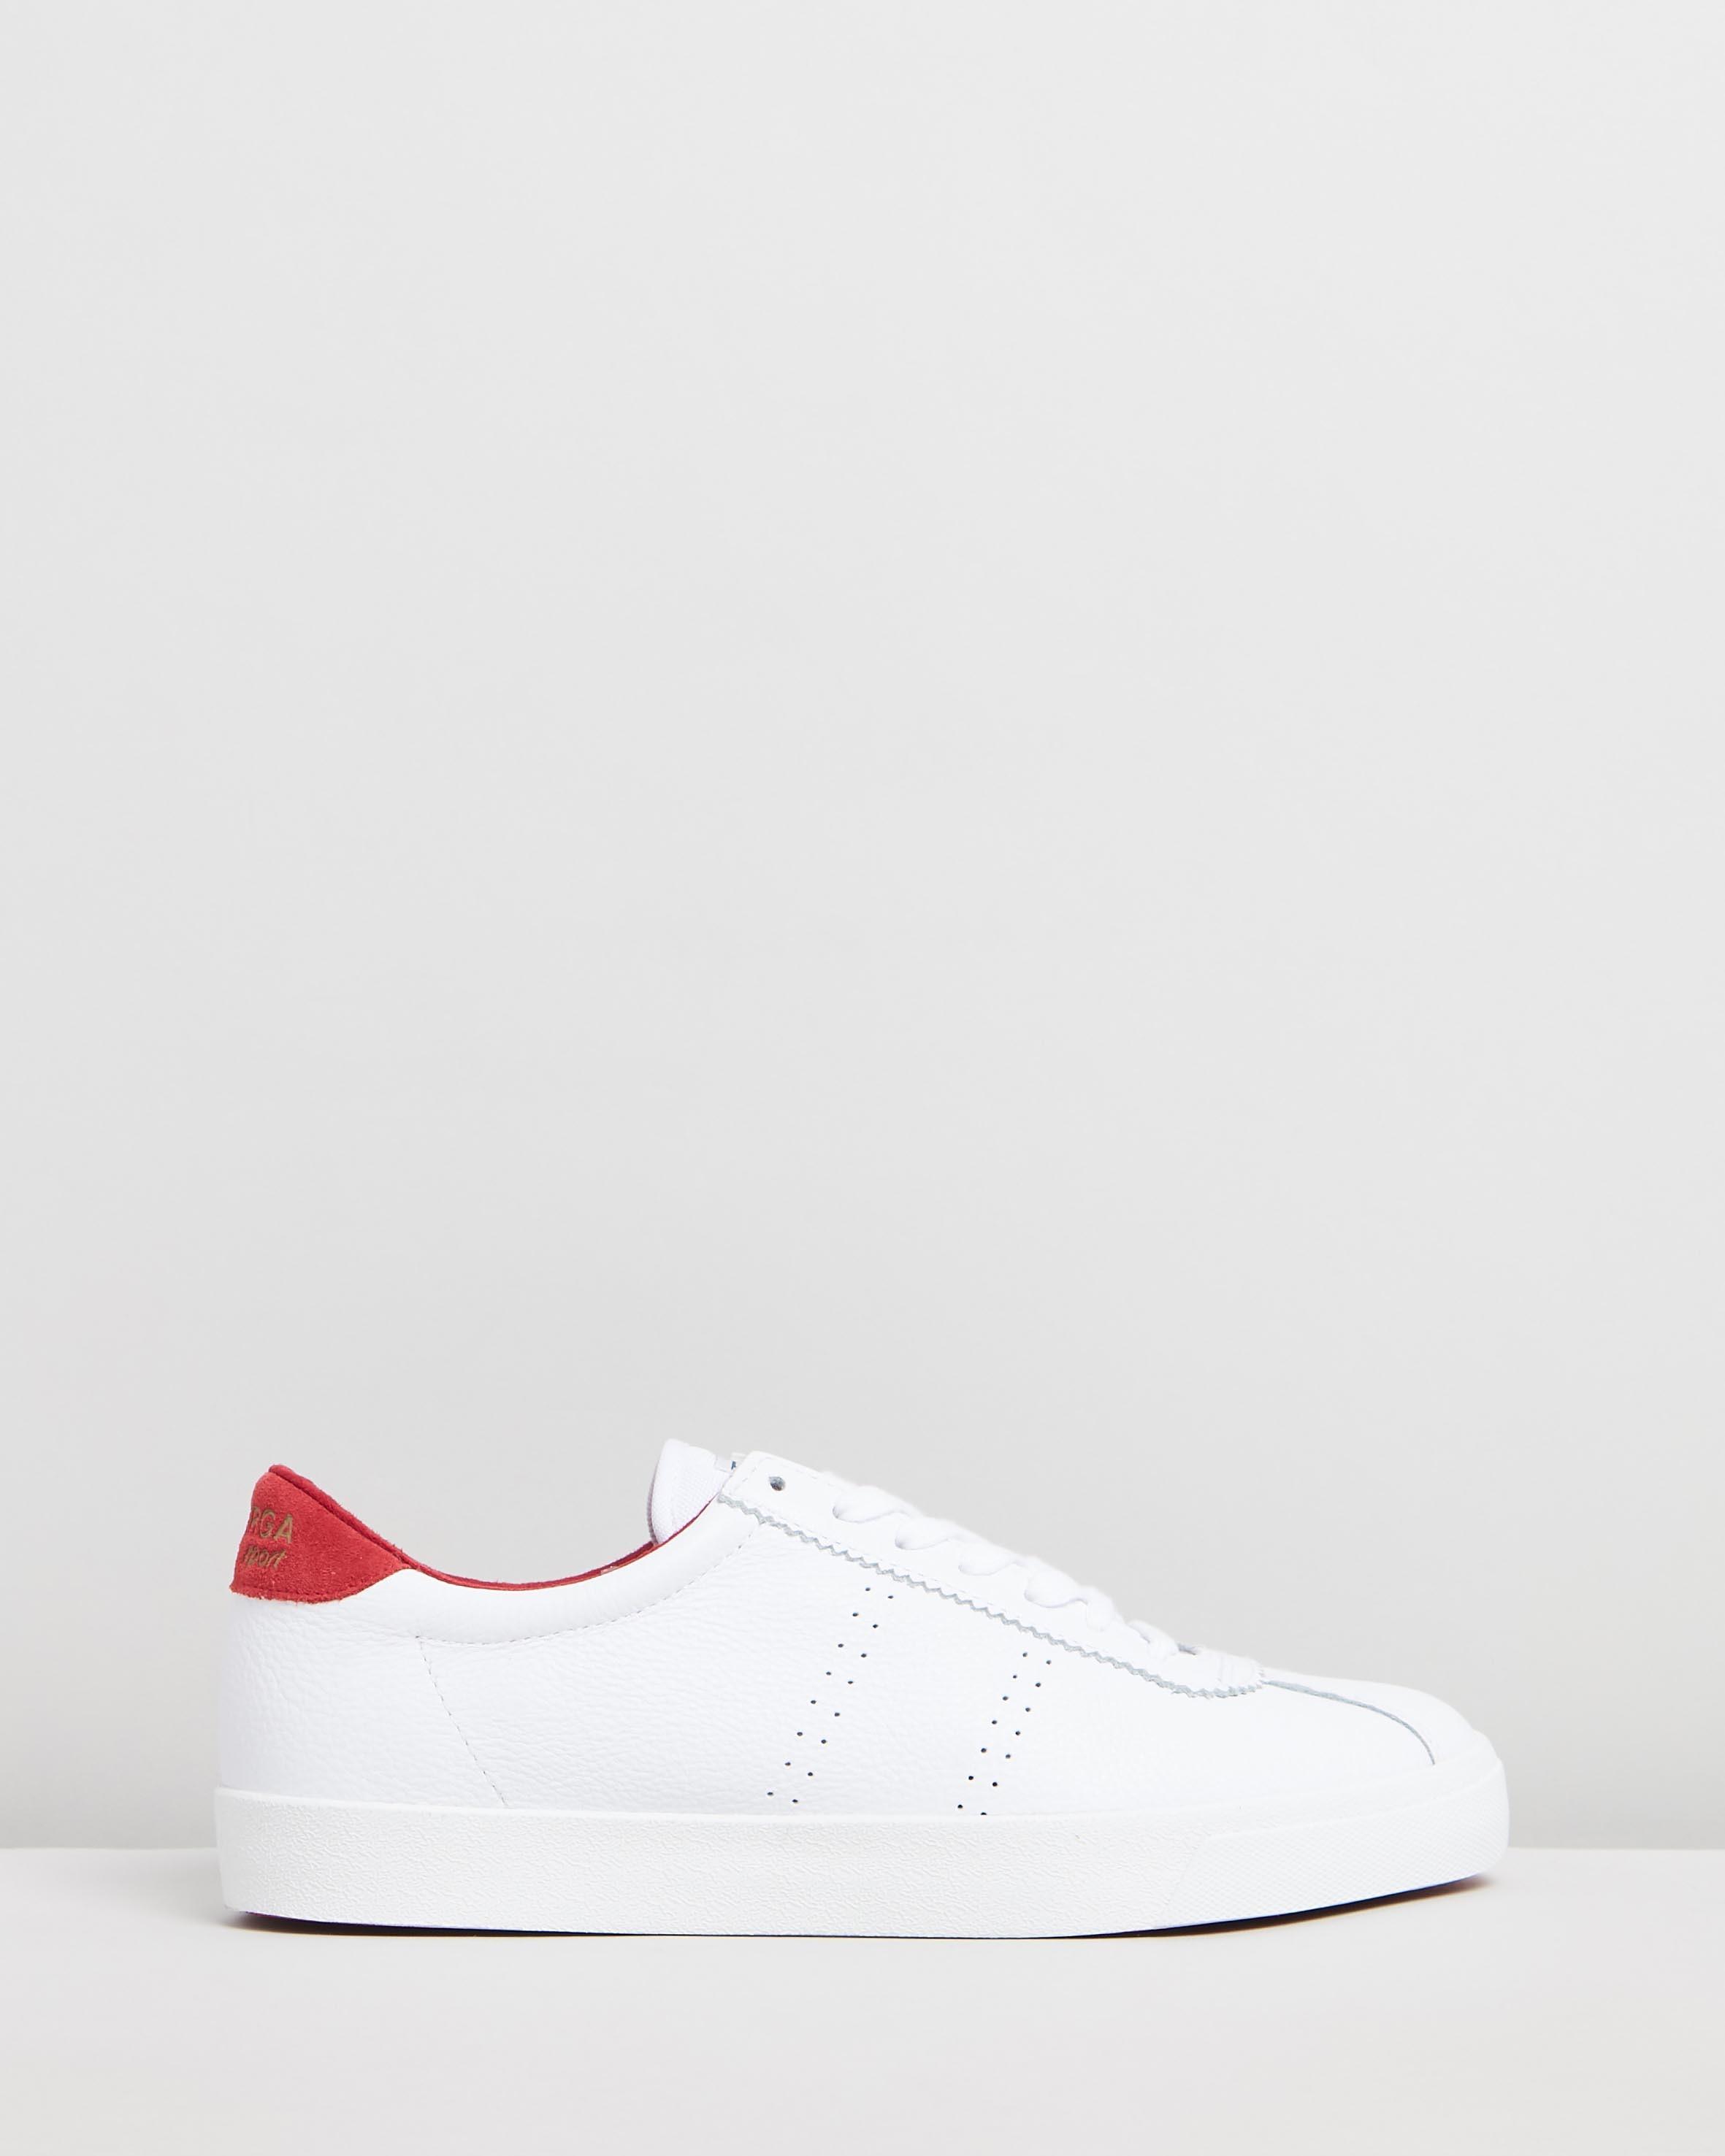 2843 Clubs Comfleau Sneakers - Women's